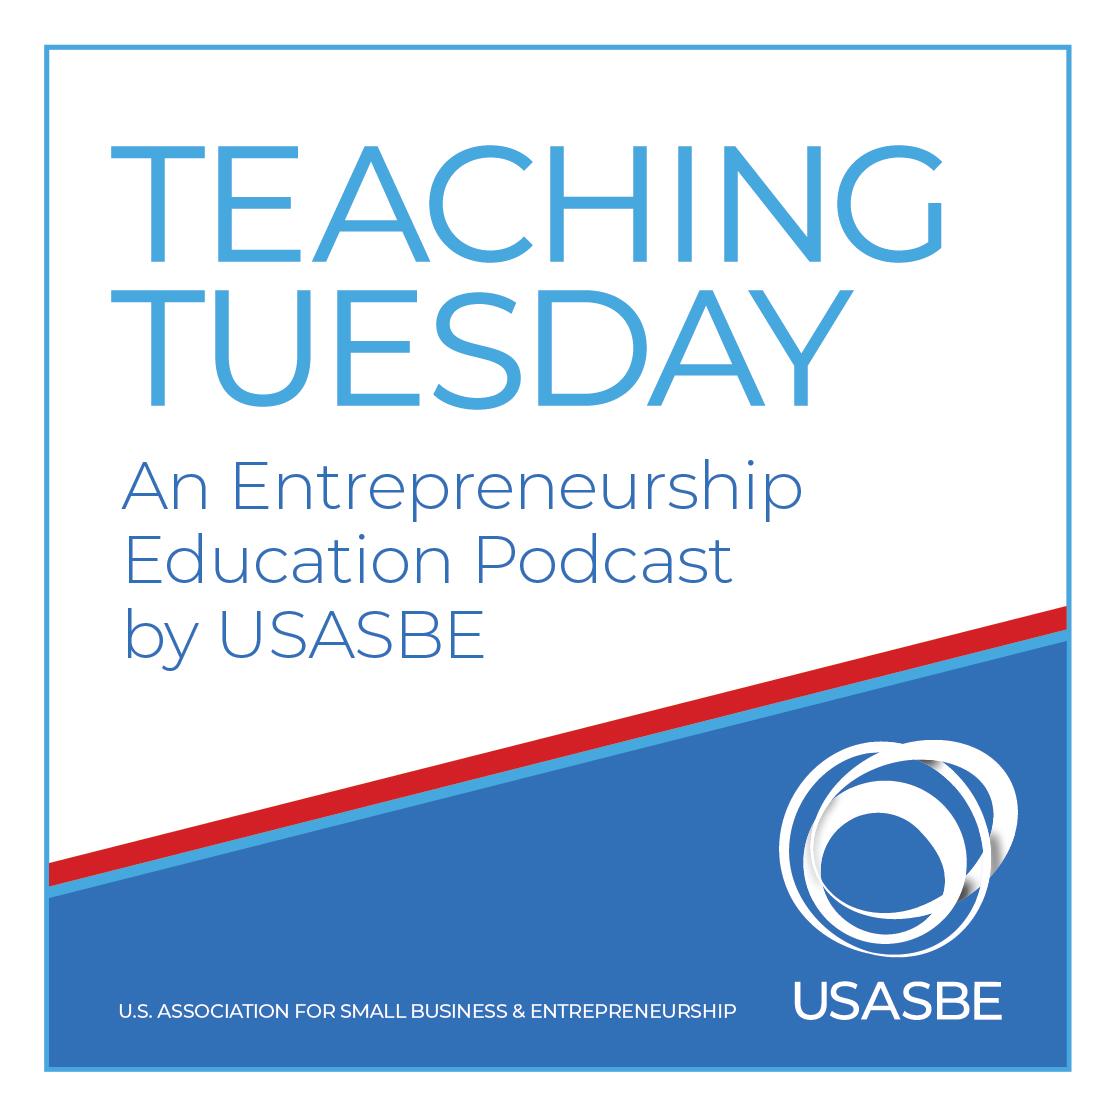 USASBE Teaching Tuesday show art